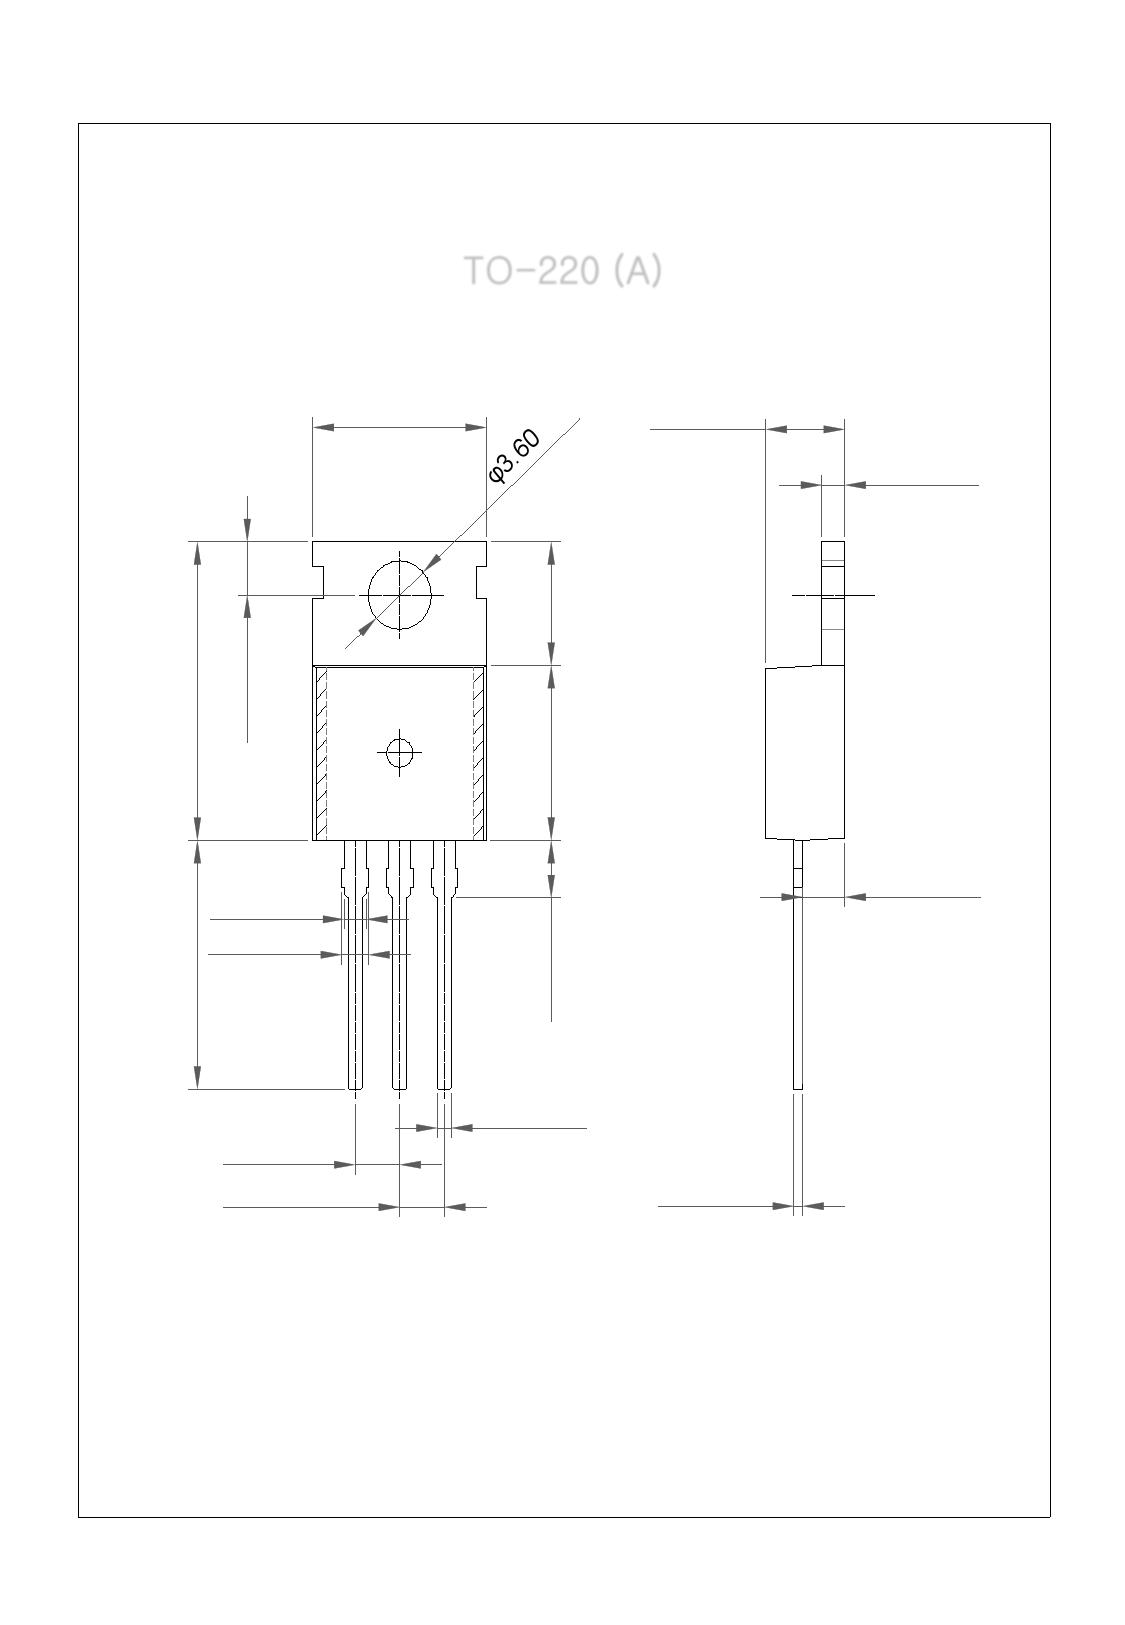 TIP100 pdf, 반도체, 판매, 대치품